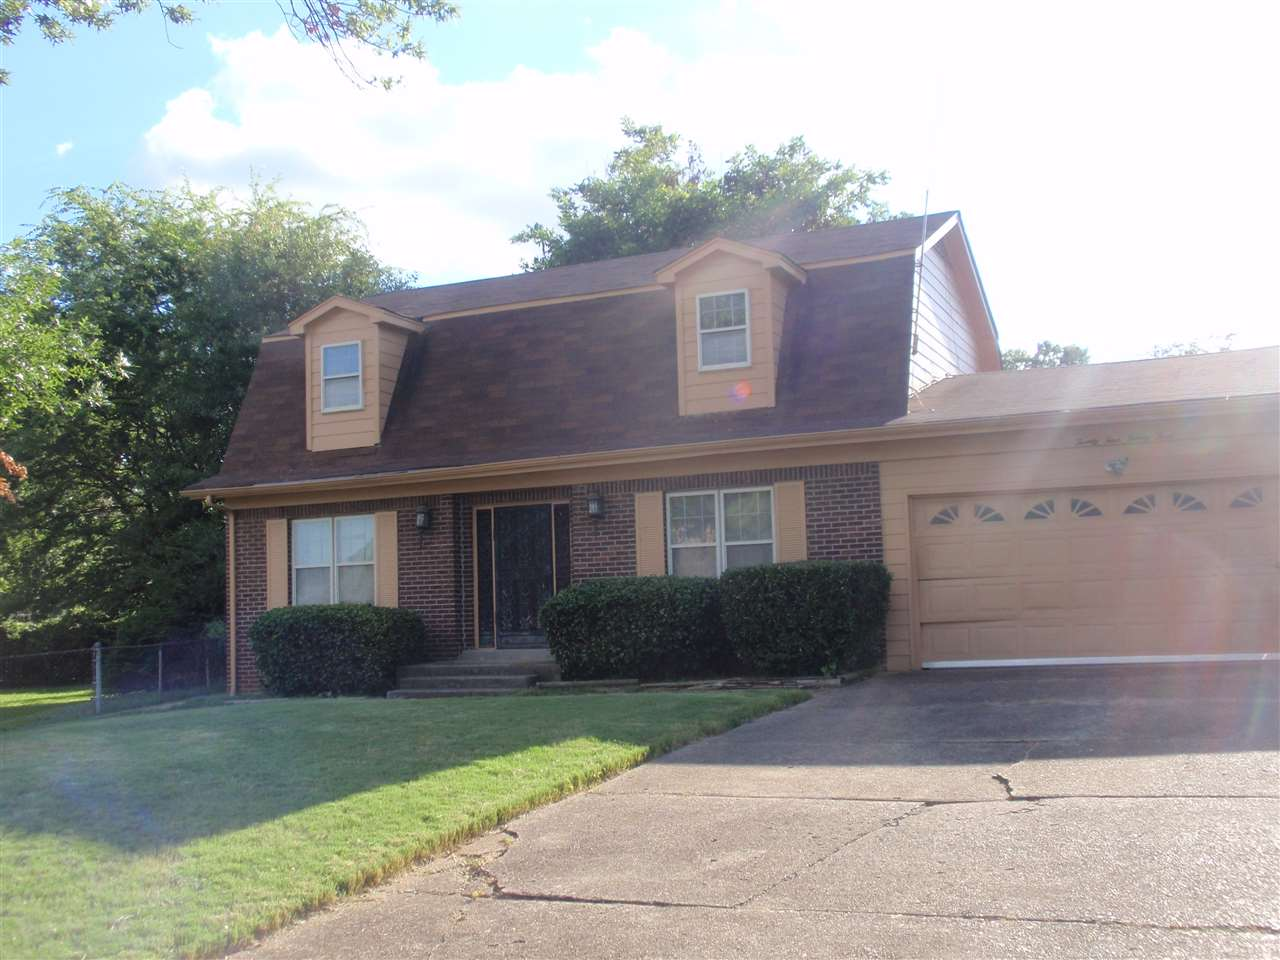 2423 Sherrie Memphis, TN 38114 - MLS #: 10008766